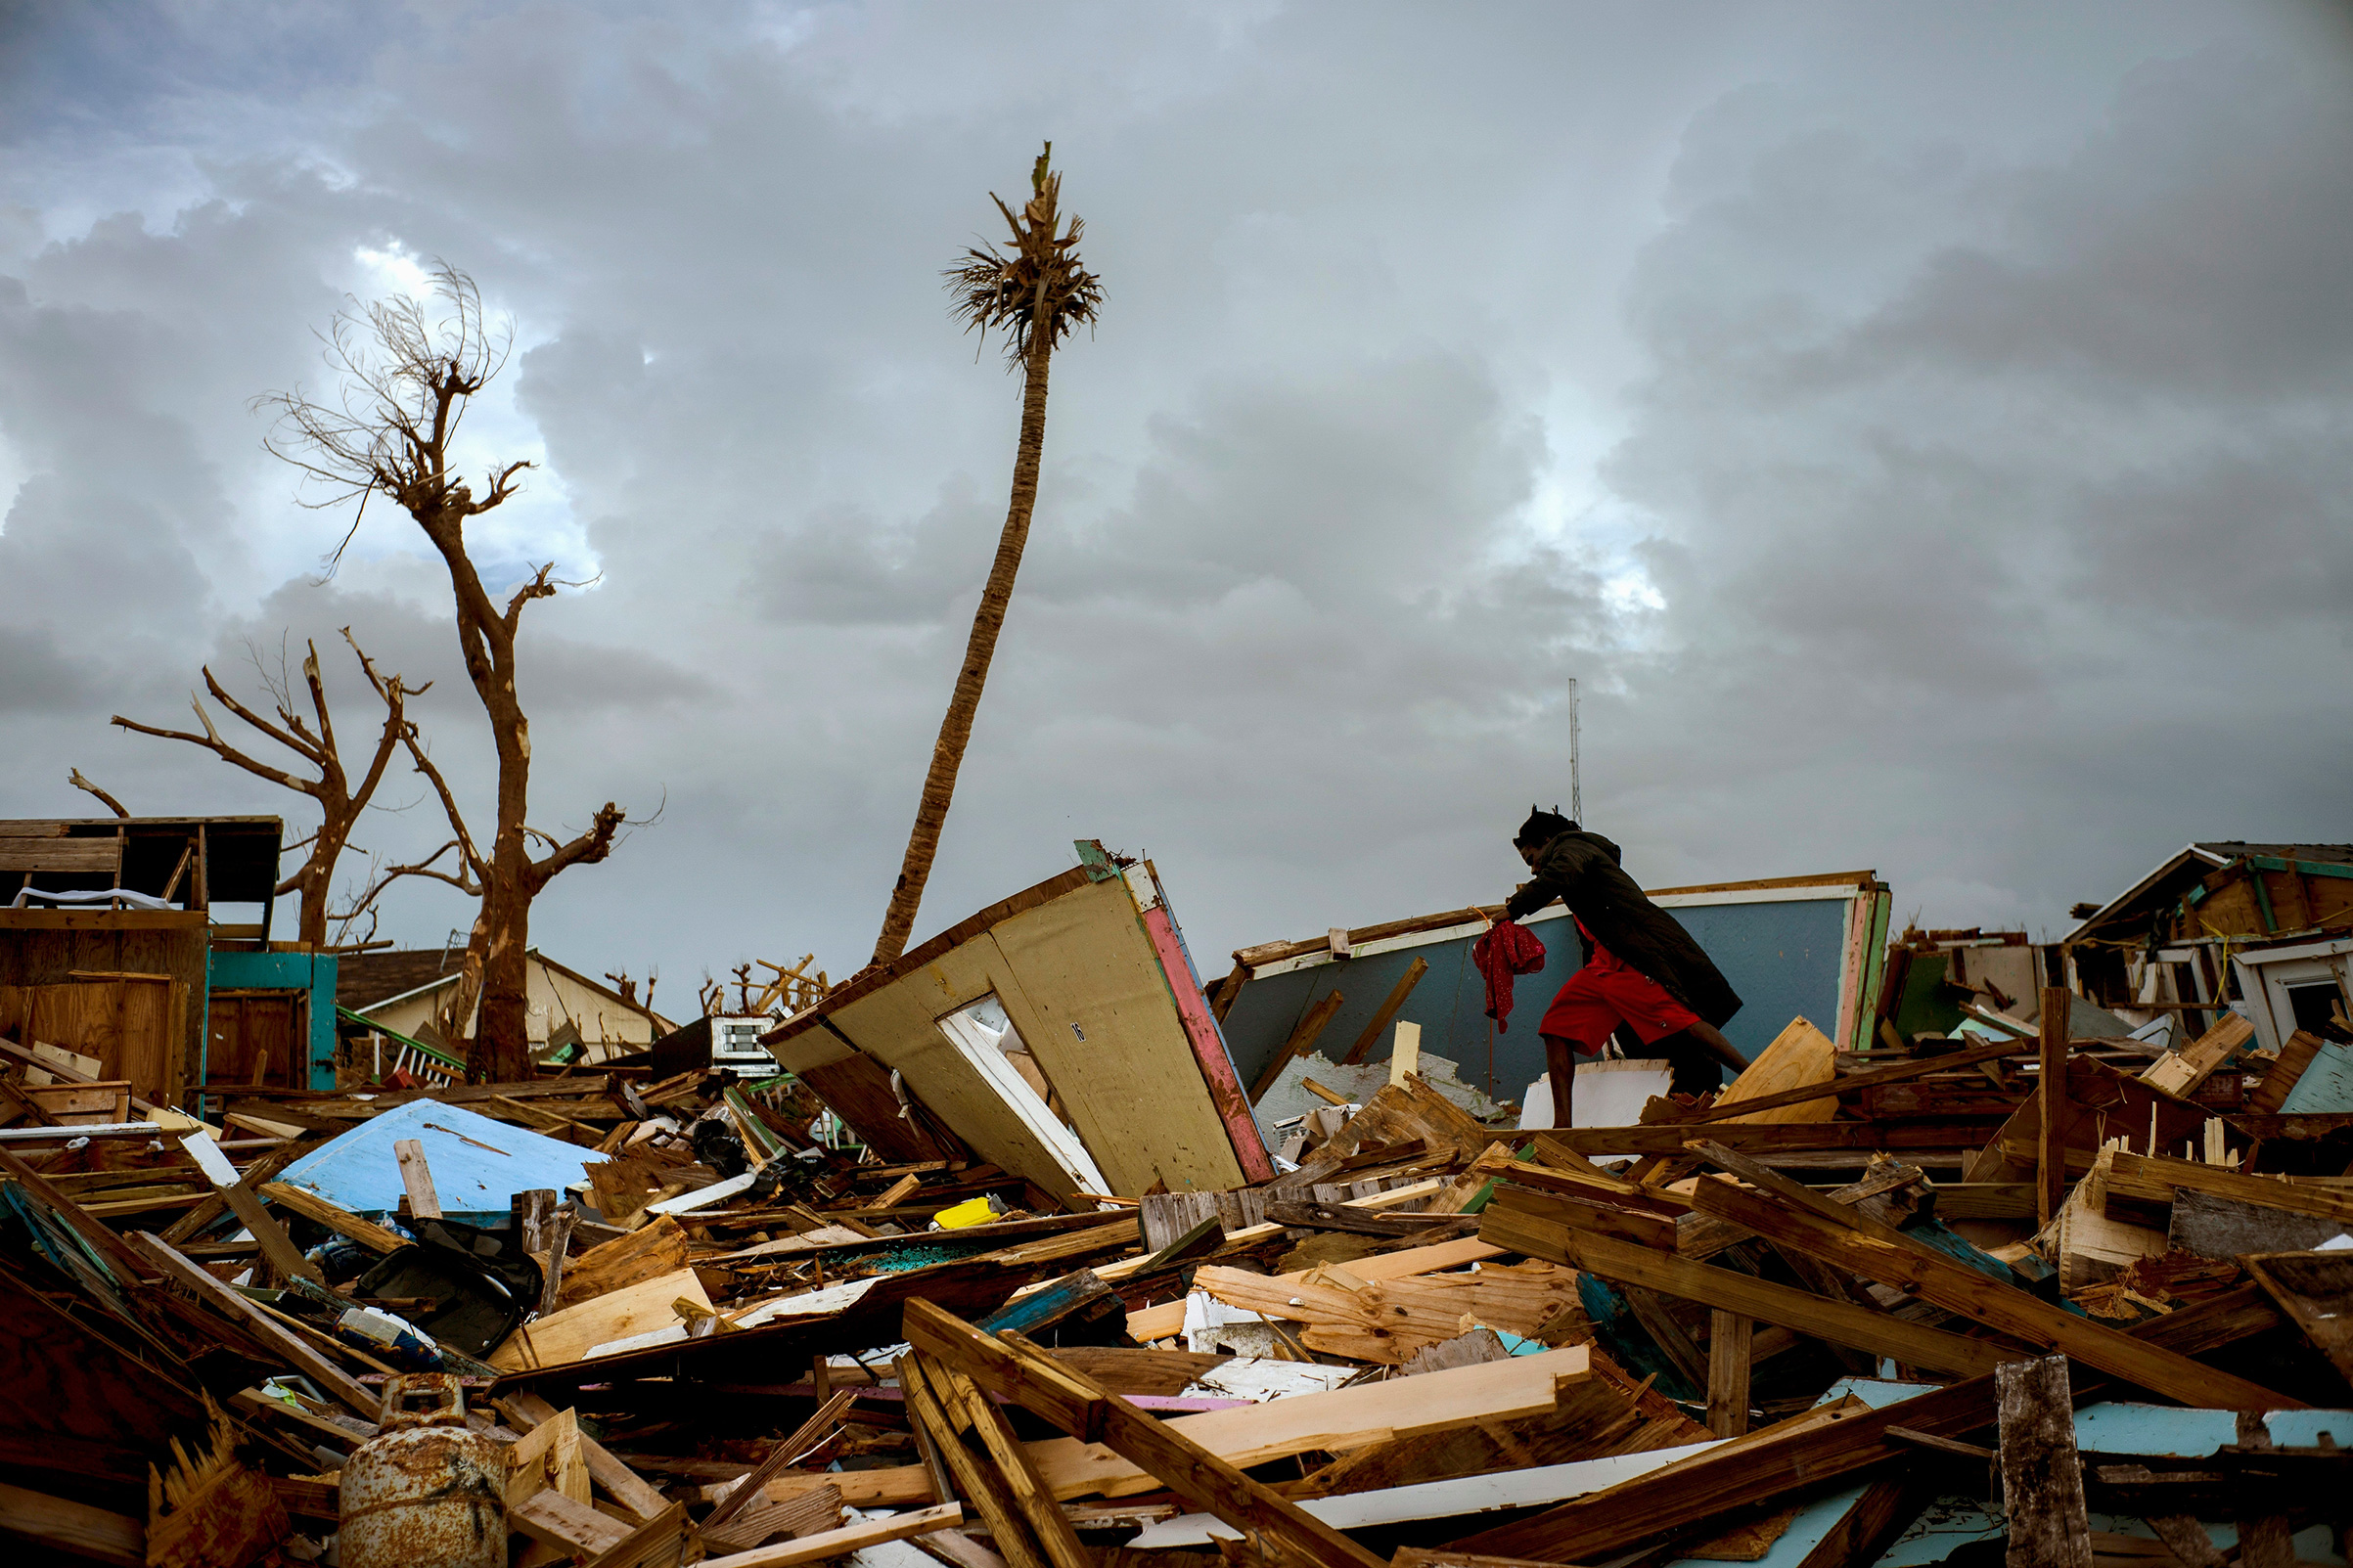 Vladimir Safford an immigrant from Haiti walks through the rubble near his home Abaco, Bahamas, Sept. 16, 2019.